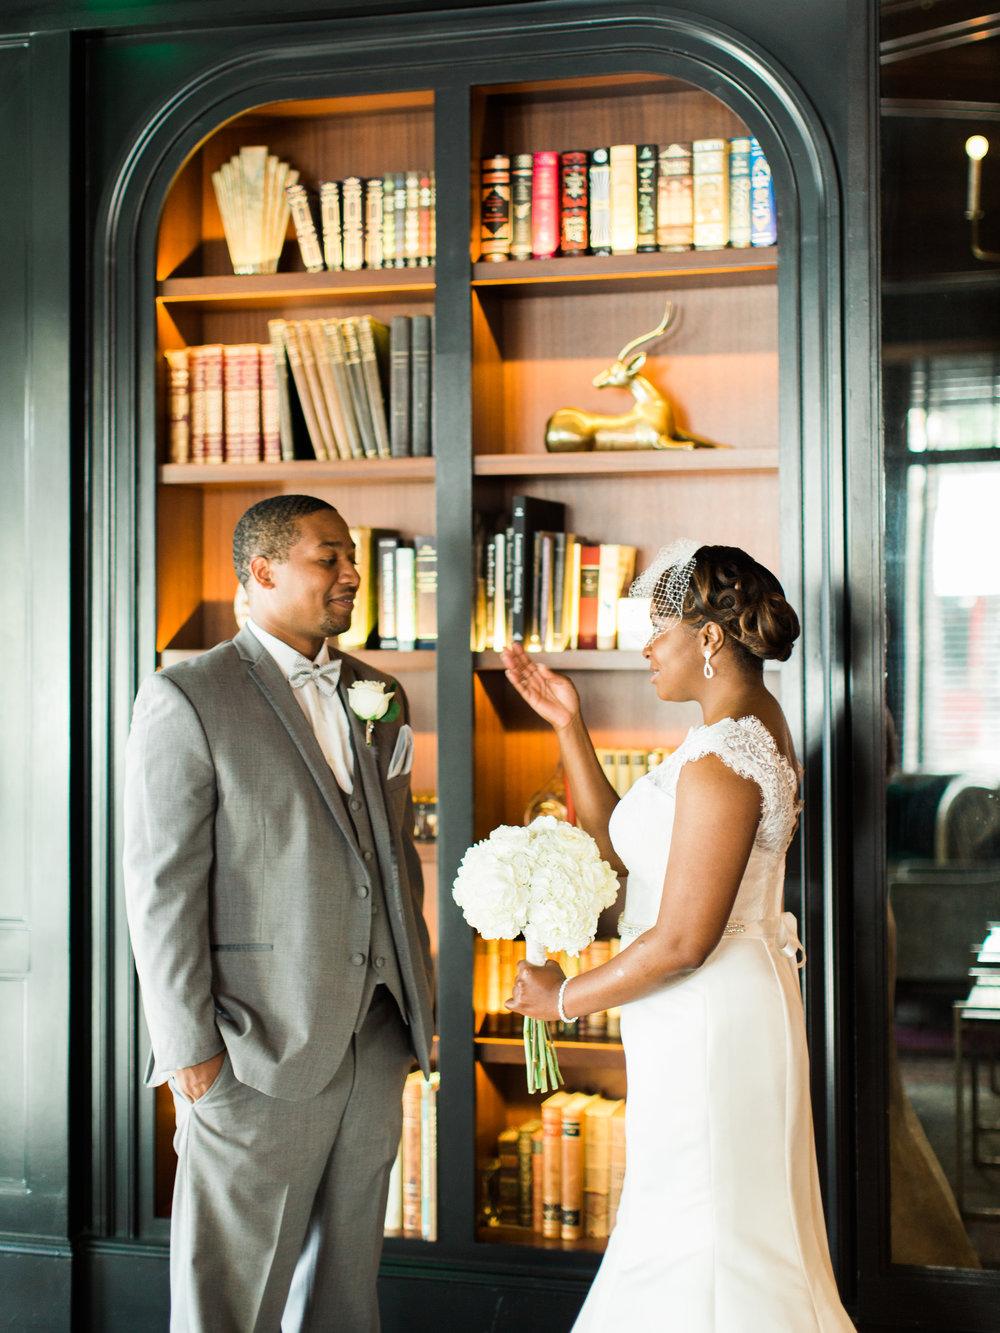 Downtown Charleston Elopement Pop-Up Wedding Planners, The Vendue, Scarlet Plan & Design (34).jpg